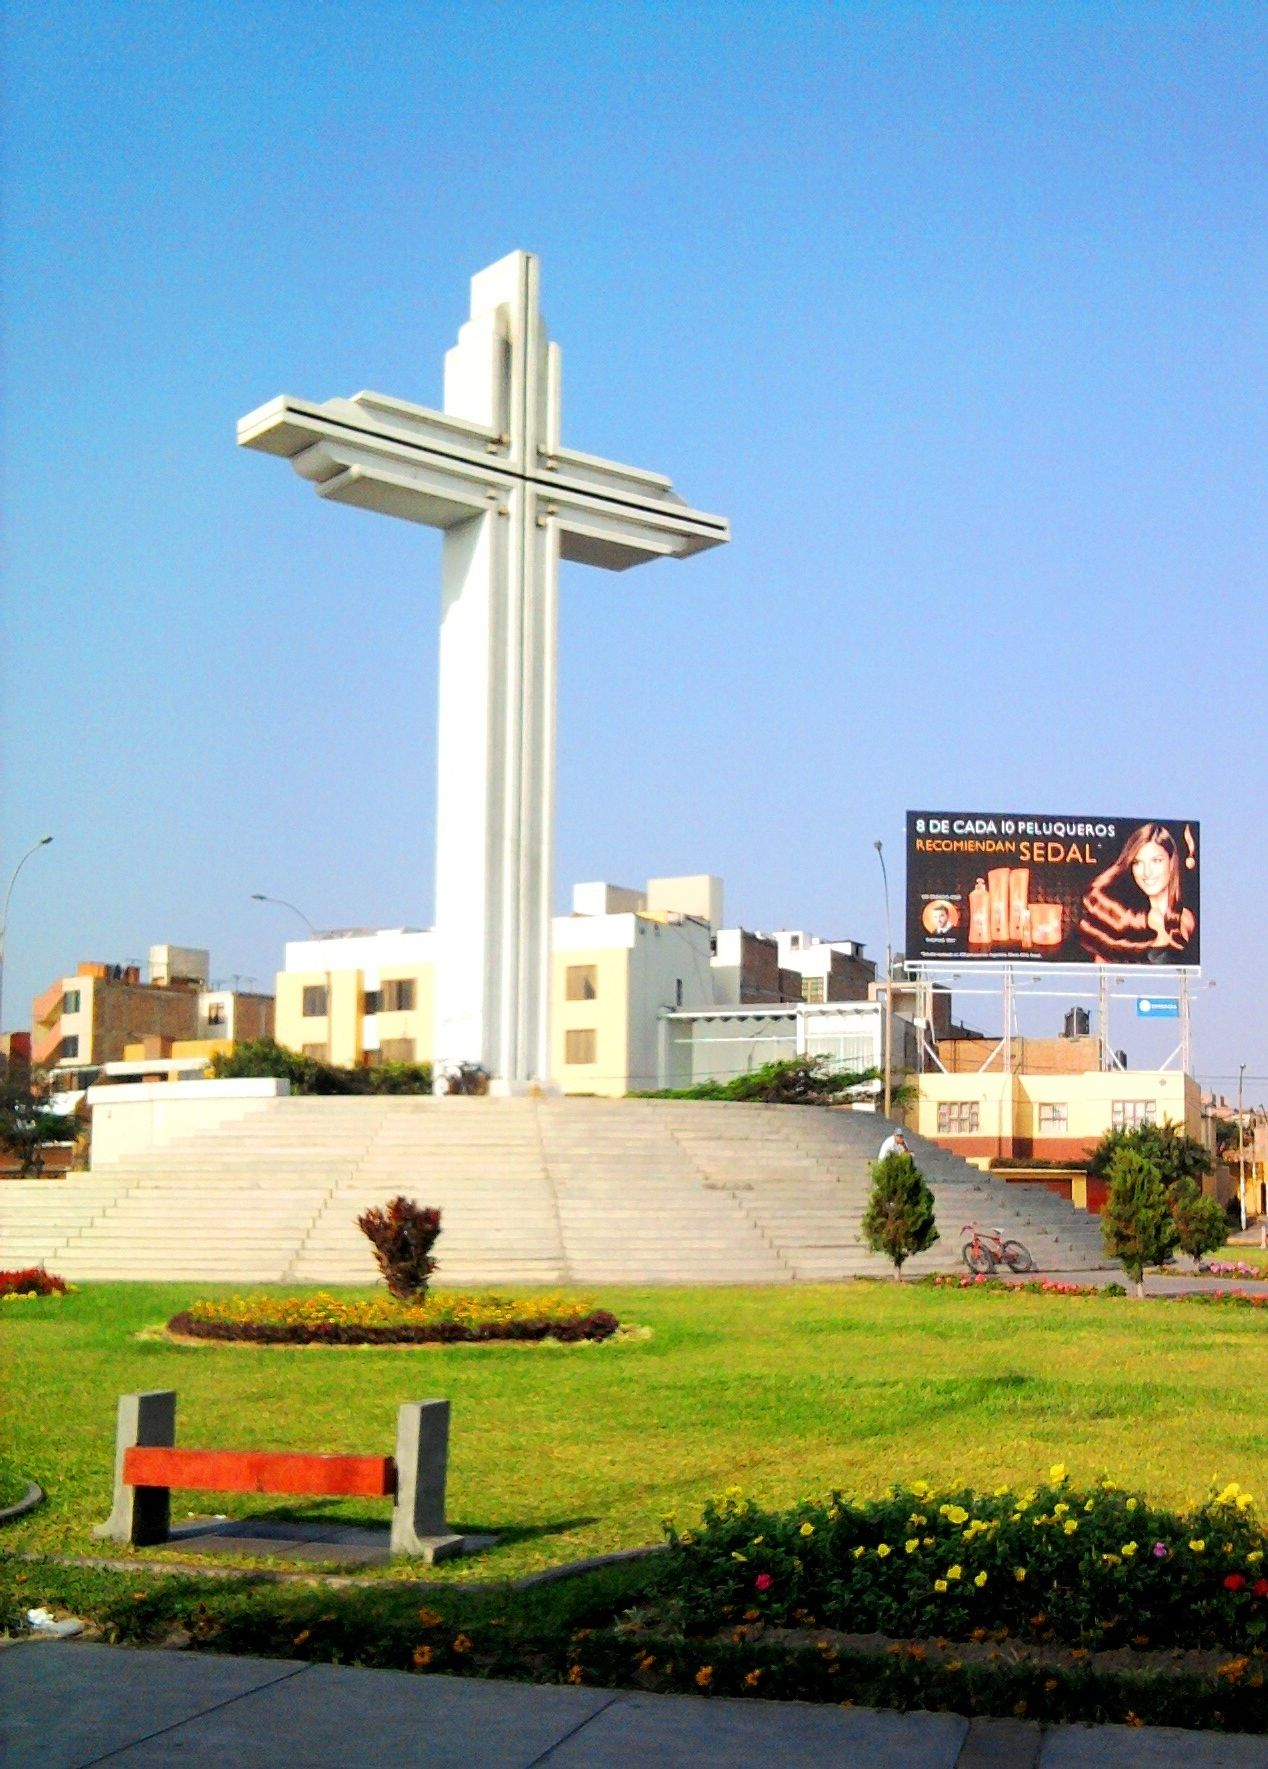 File:Ovalo papal - Trujillo ,Perú.jpg - Wikimedia Commons